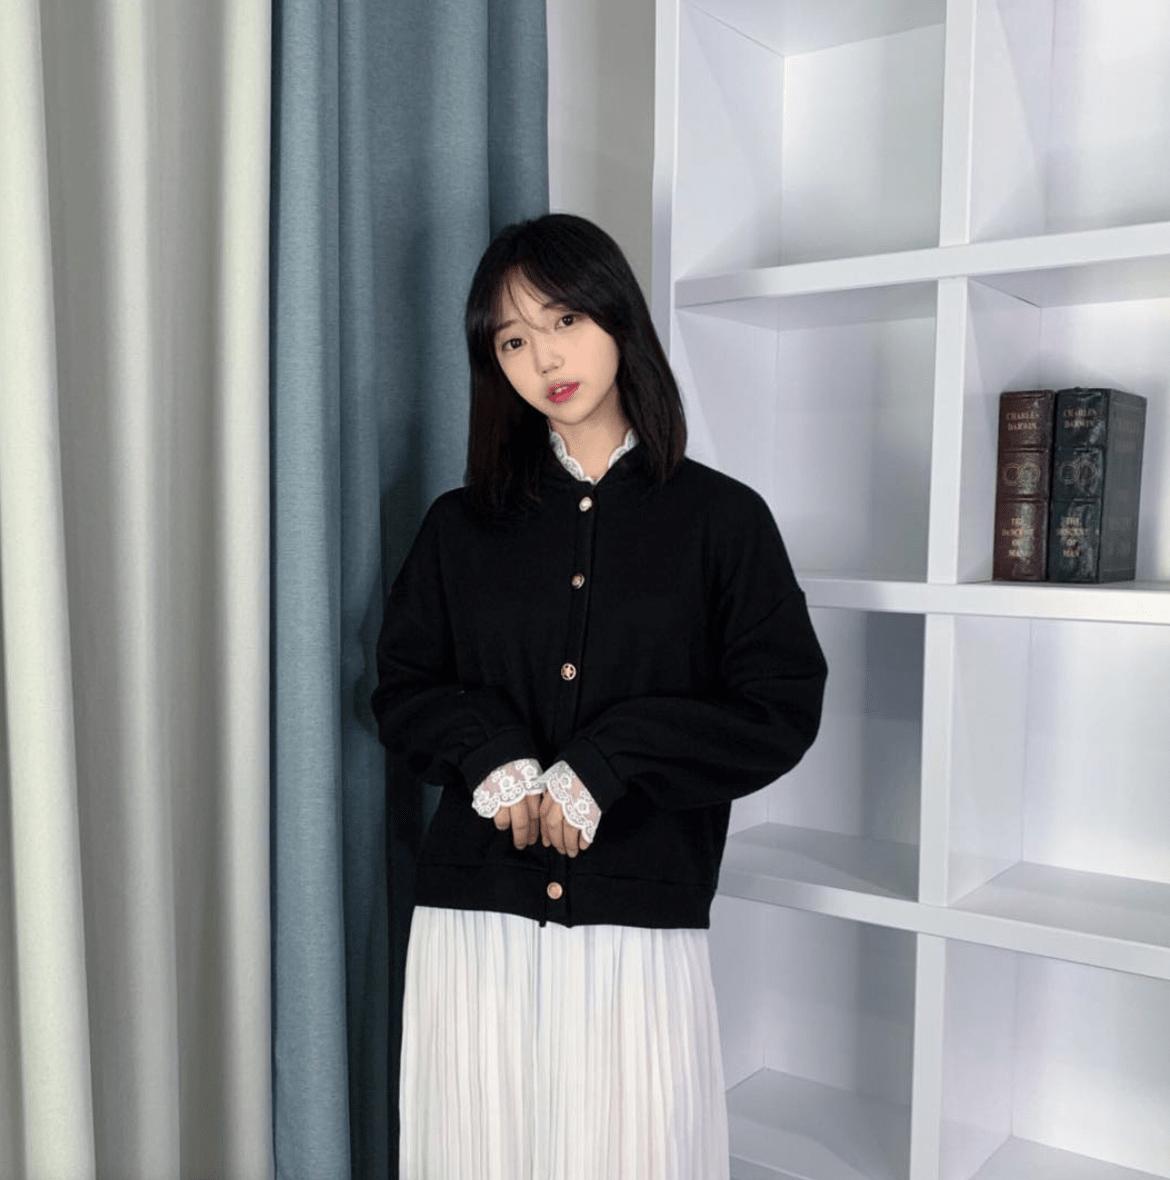 korean-instagram-influencer-social-media-model-nyong99u-3.png